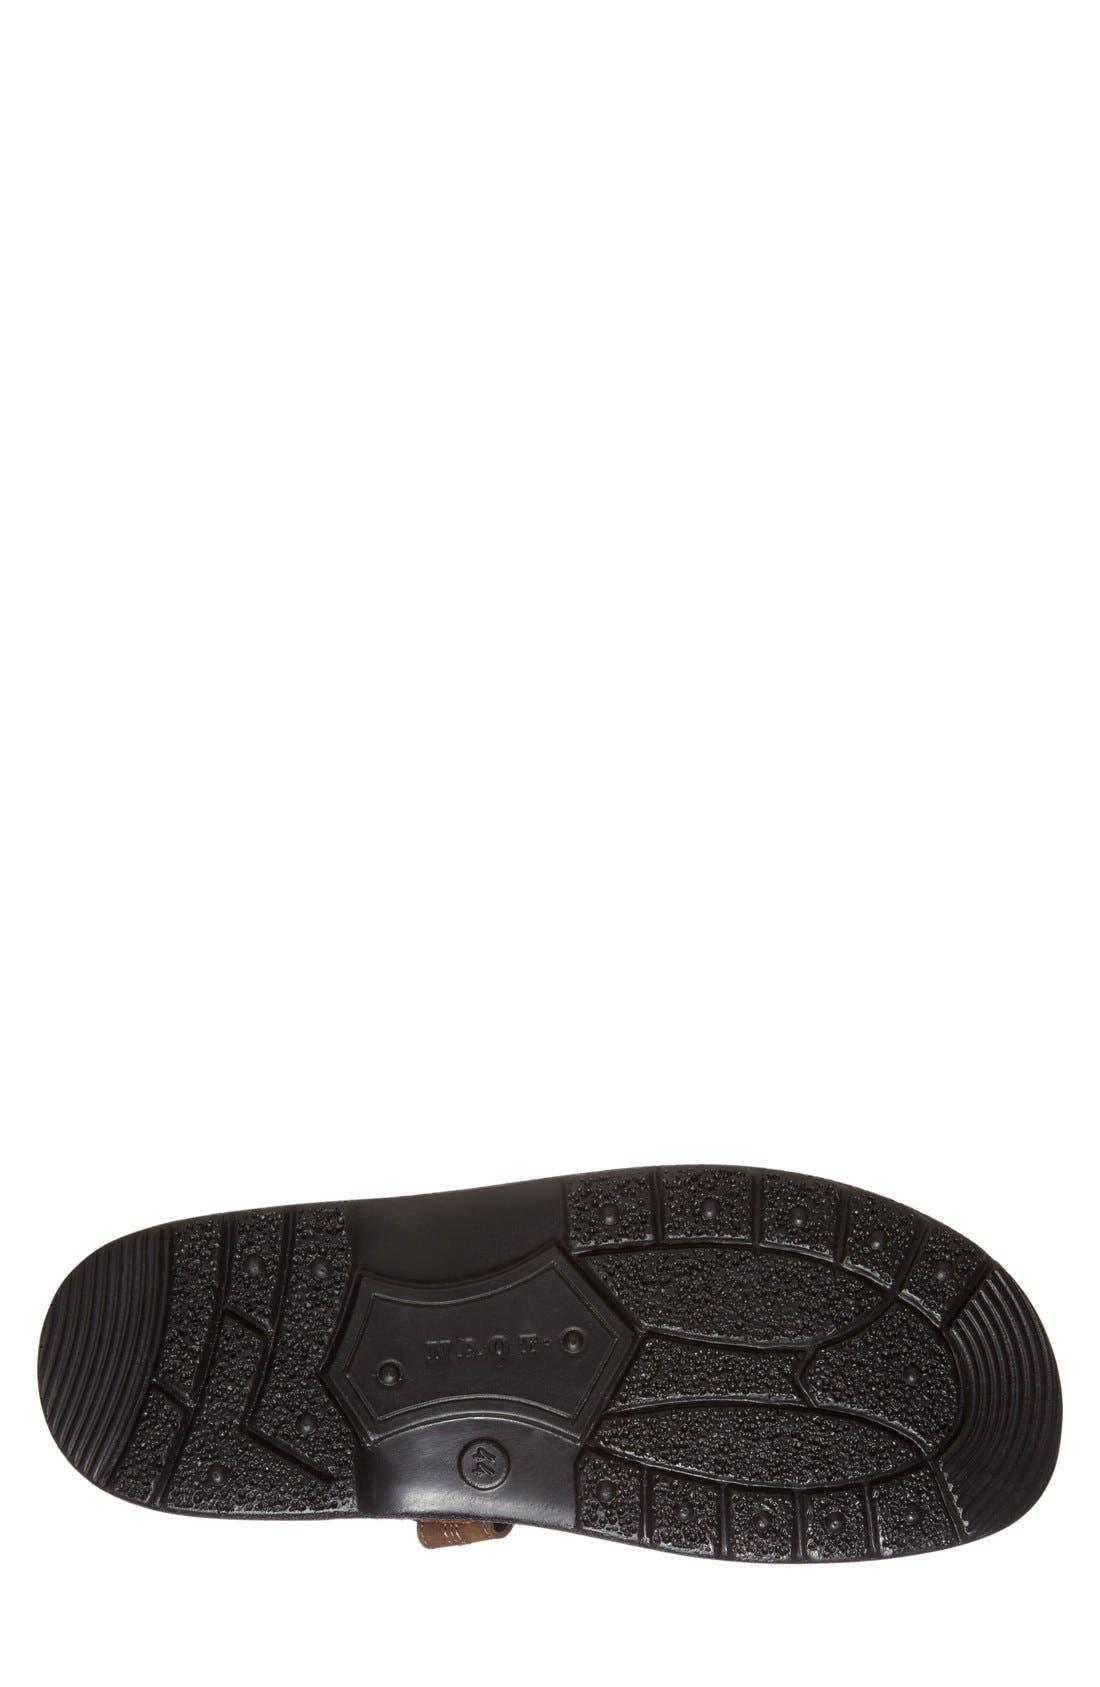 Balkan Sandal,                             Alternate thumbnail 4, color,                             Brown Leather